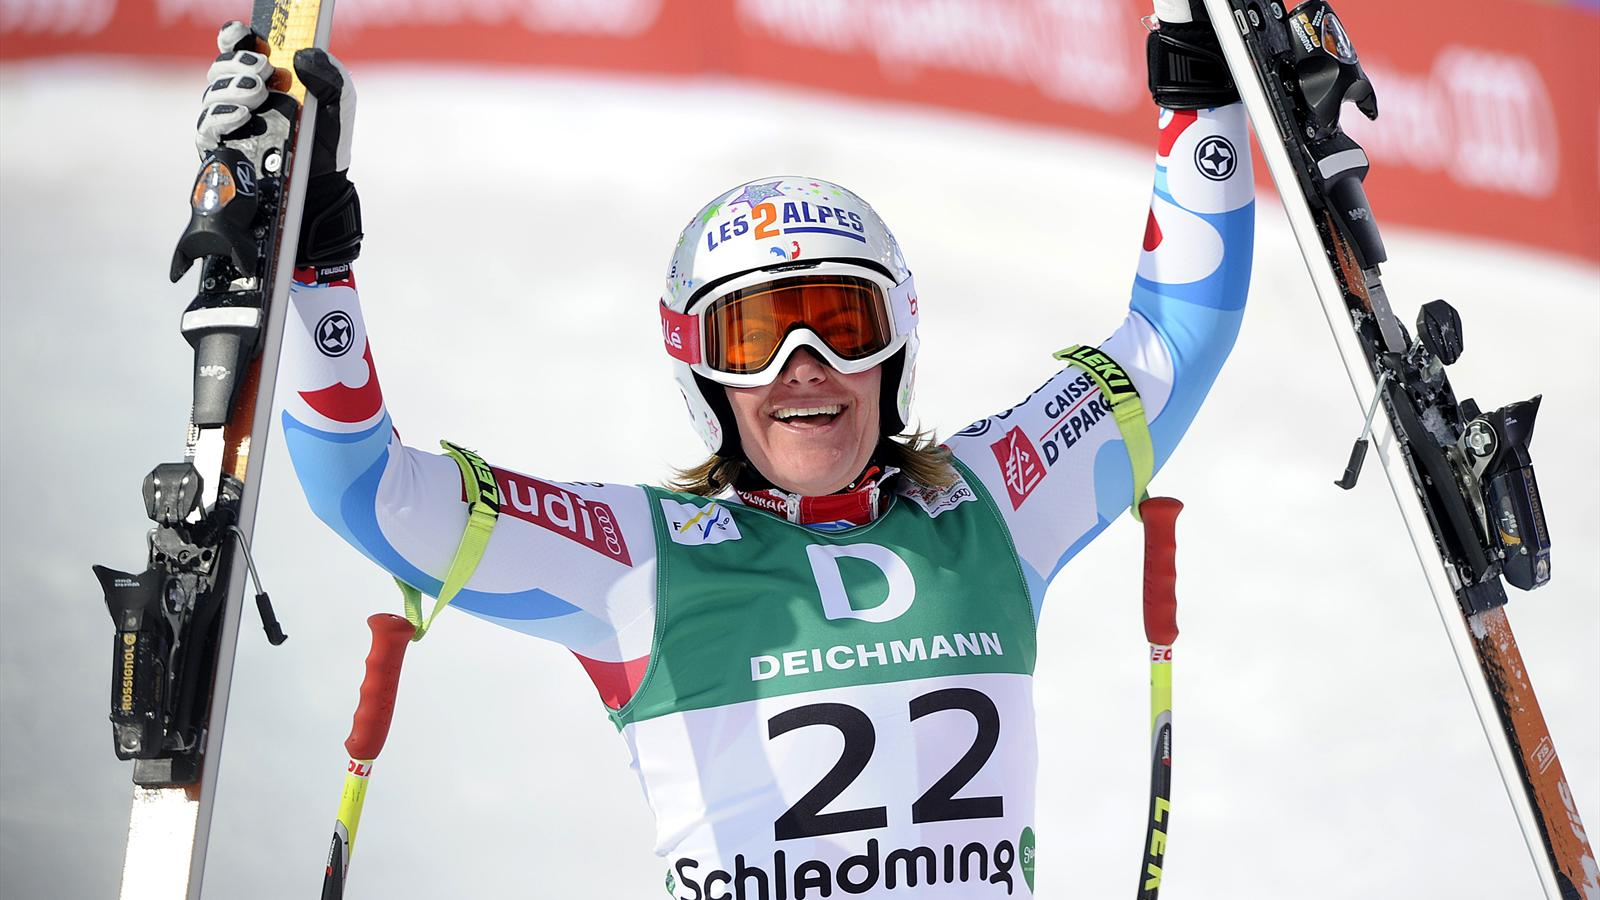 marion rolland championne du monde de descente en 2013 prend sa retraite ski alpin eurosport. Black Bedroom Furniture Sets. Home Design Ideas